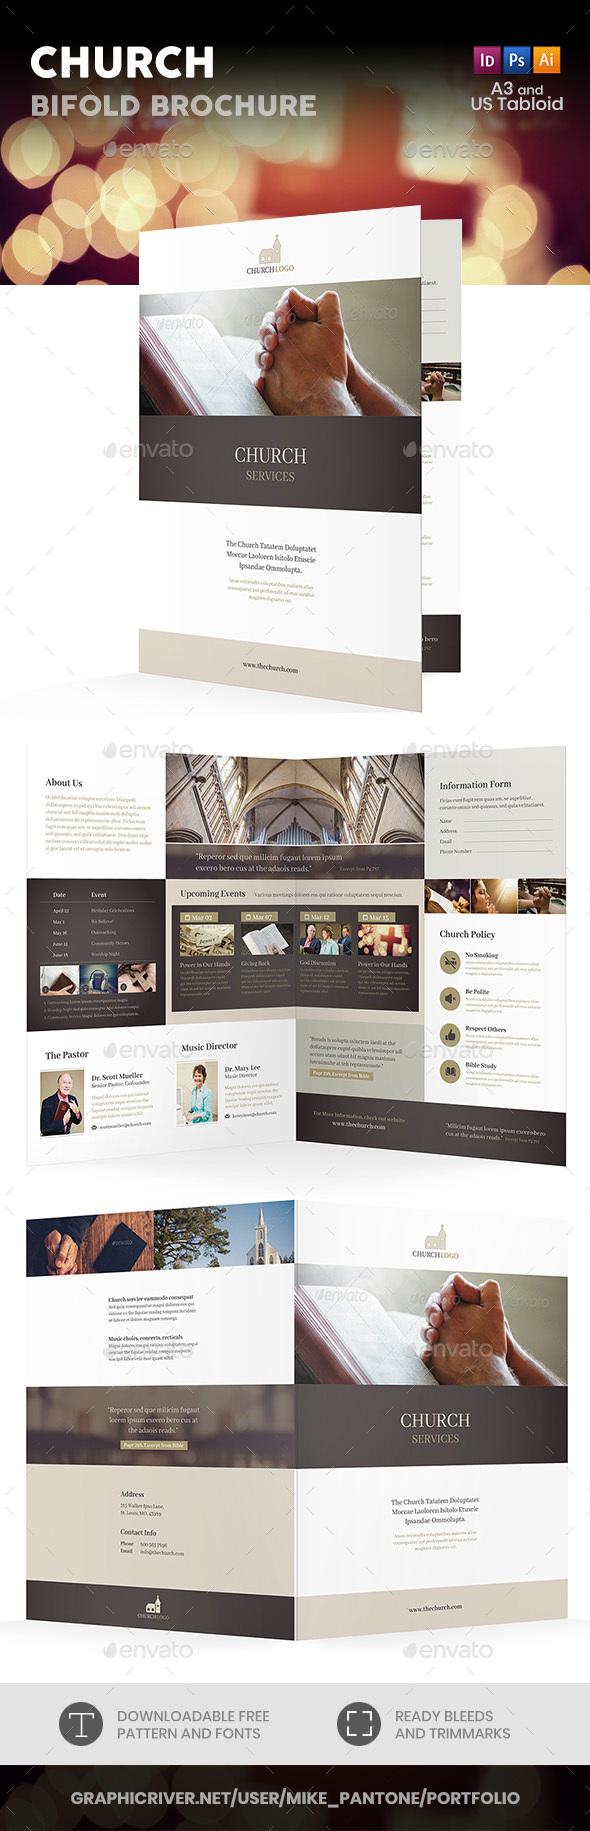 Church Bifold / Halffold Brochure 4 - Informational Brochures